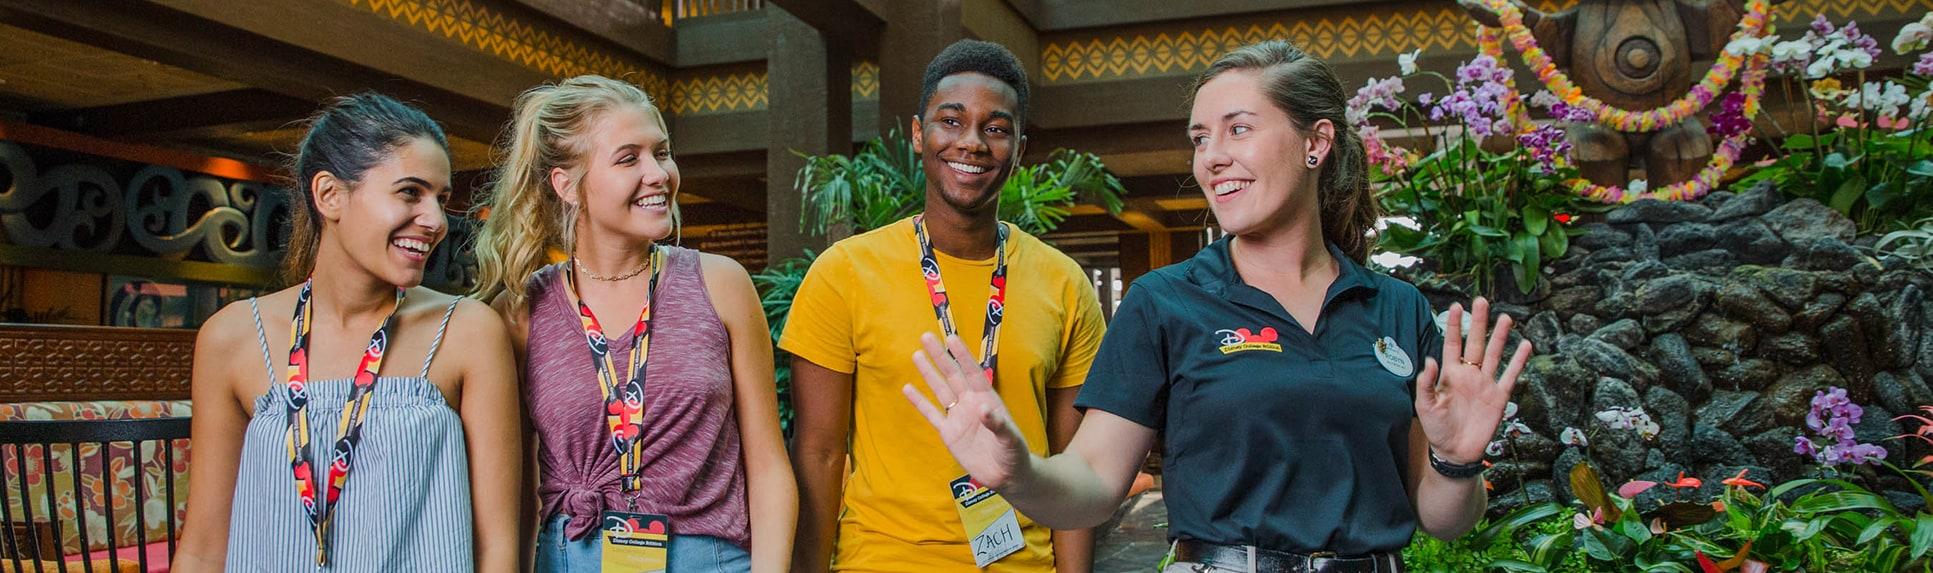 A female Disney Cast Member leads 3 teenage students through a Polynesian themed lobby